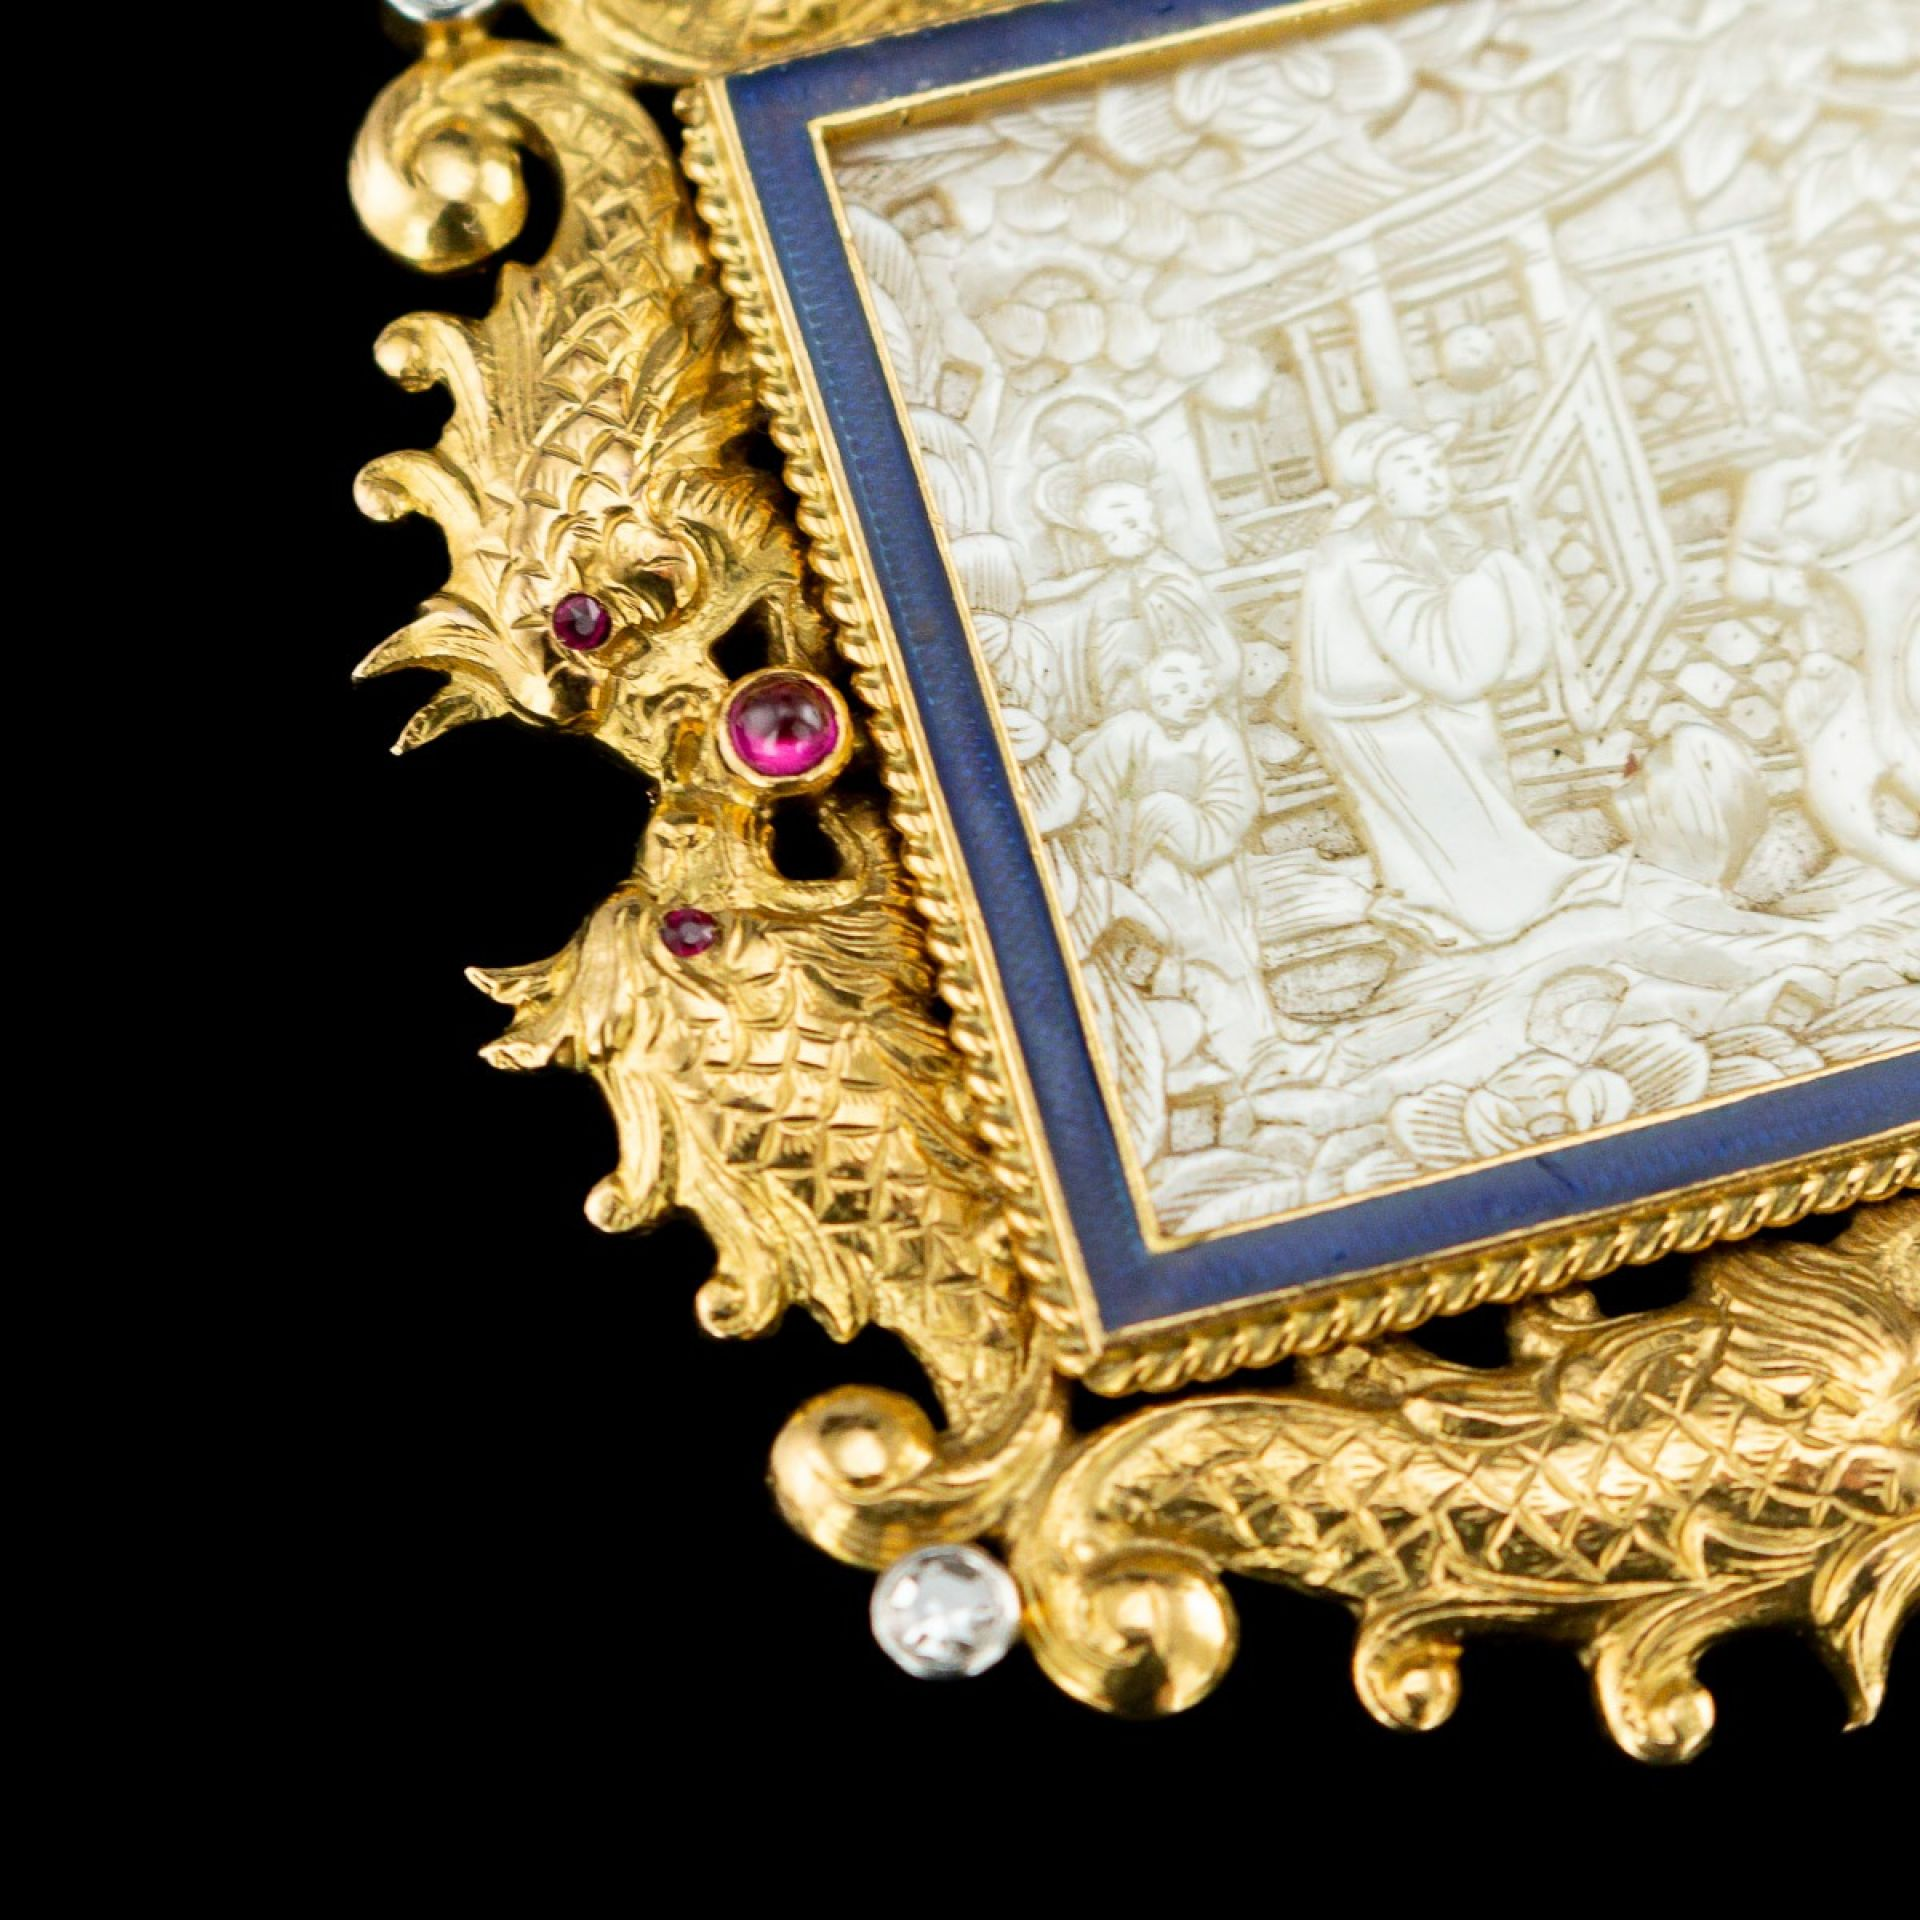 ANTIQUE 19thC FRENCH CHINOISERIE 18K GOLD, GEM-SET & ENAMEL BROOCH c.1890